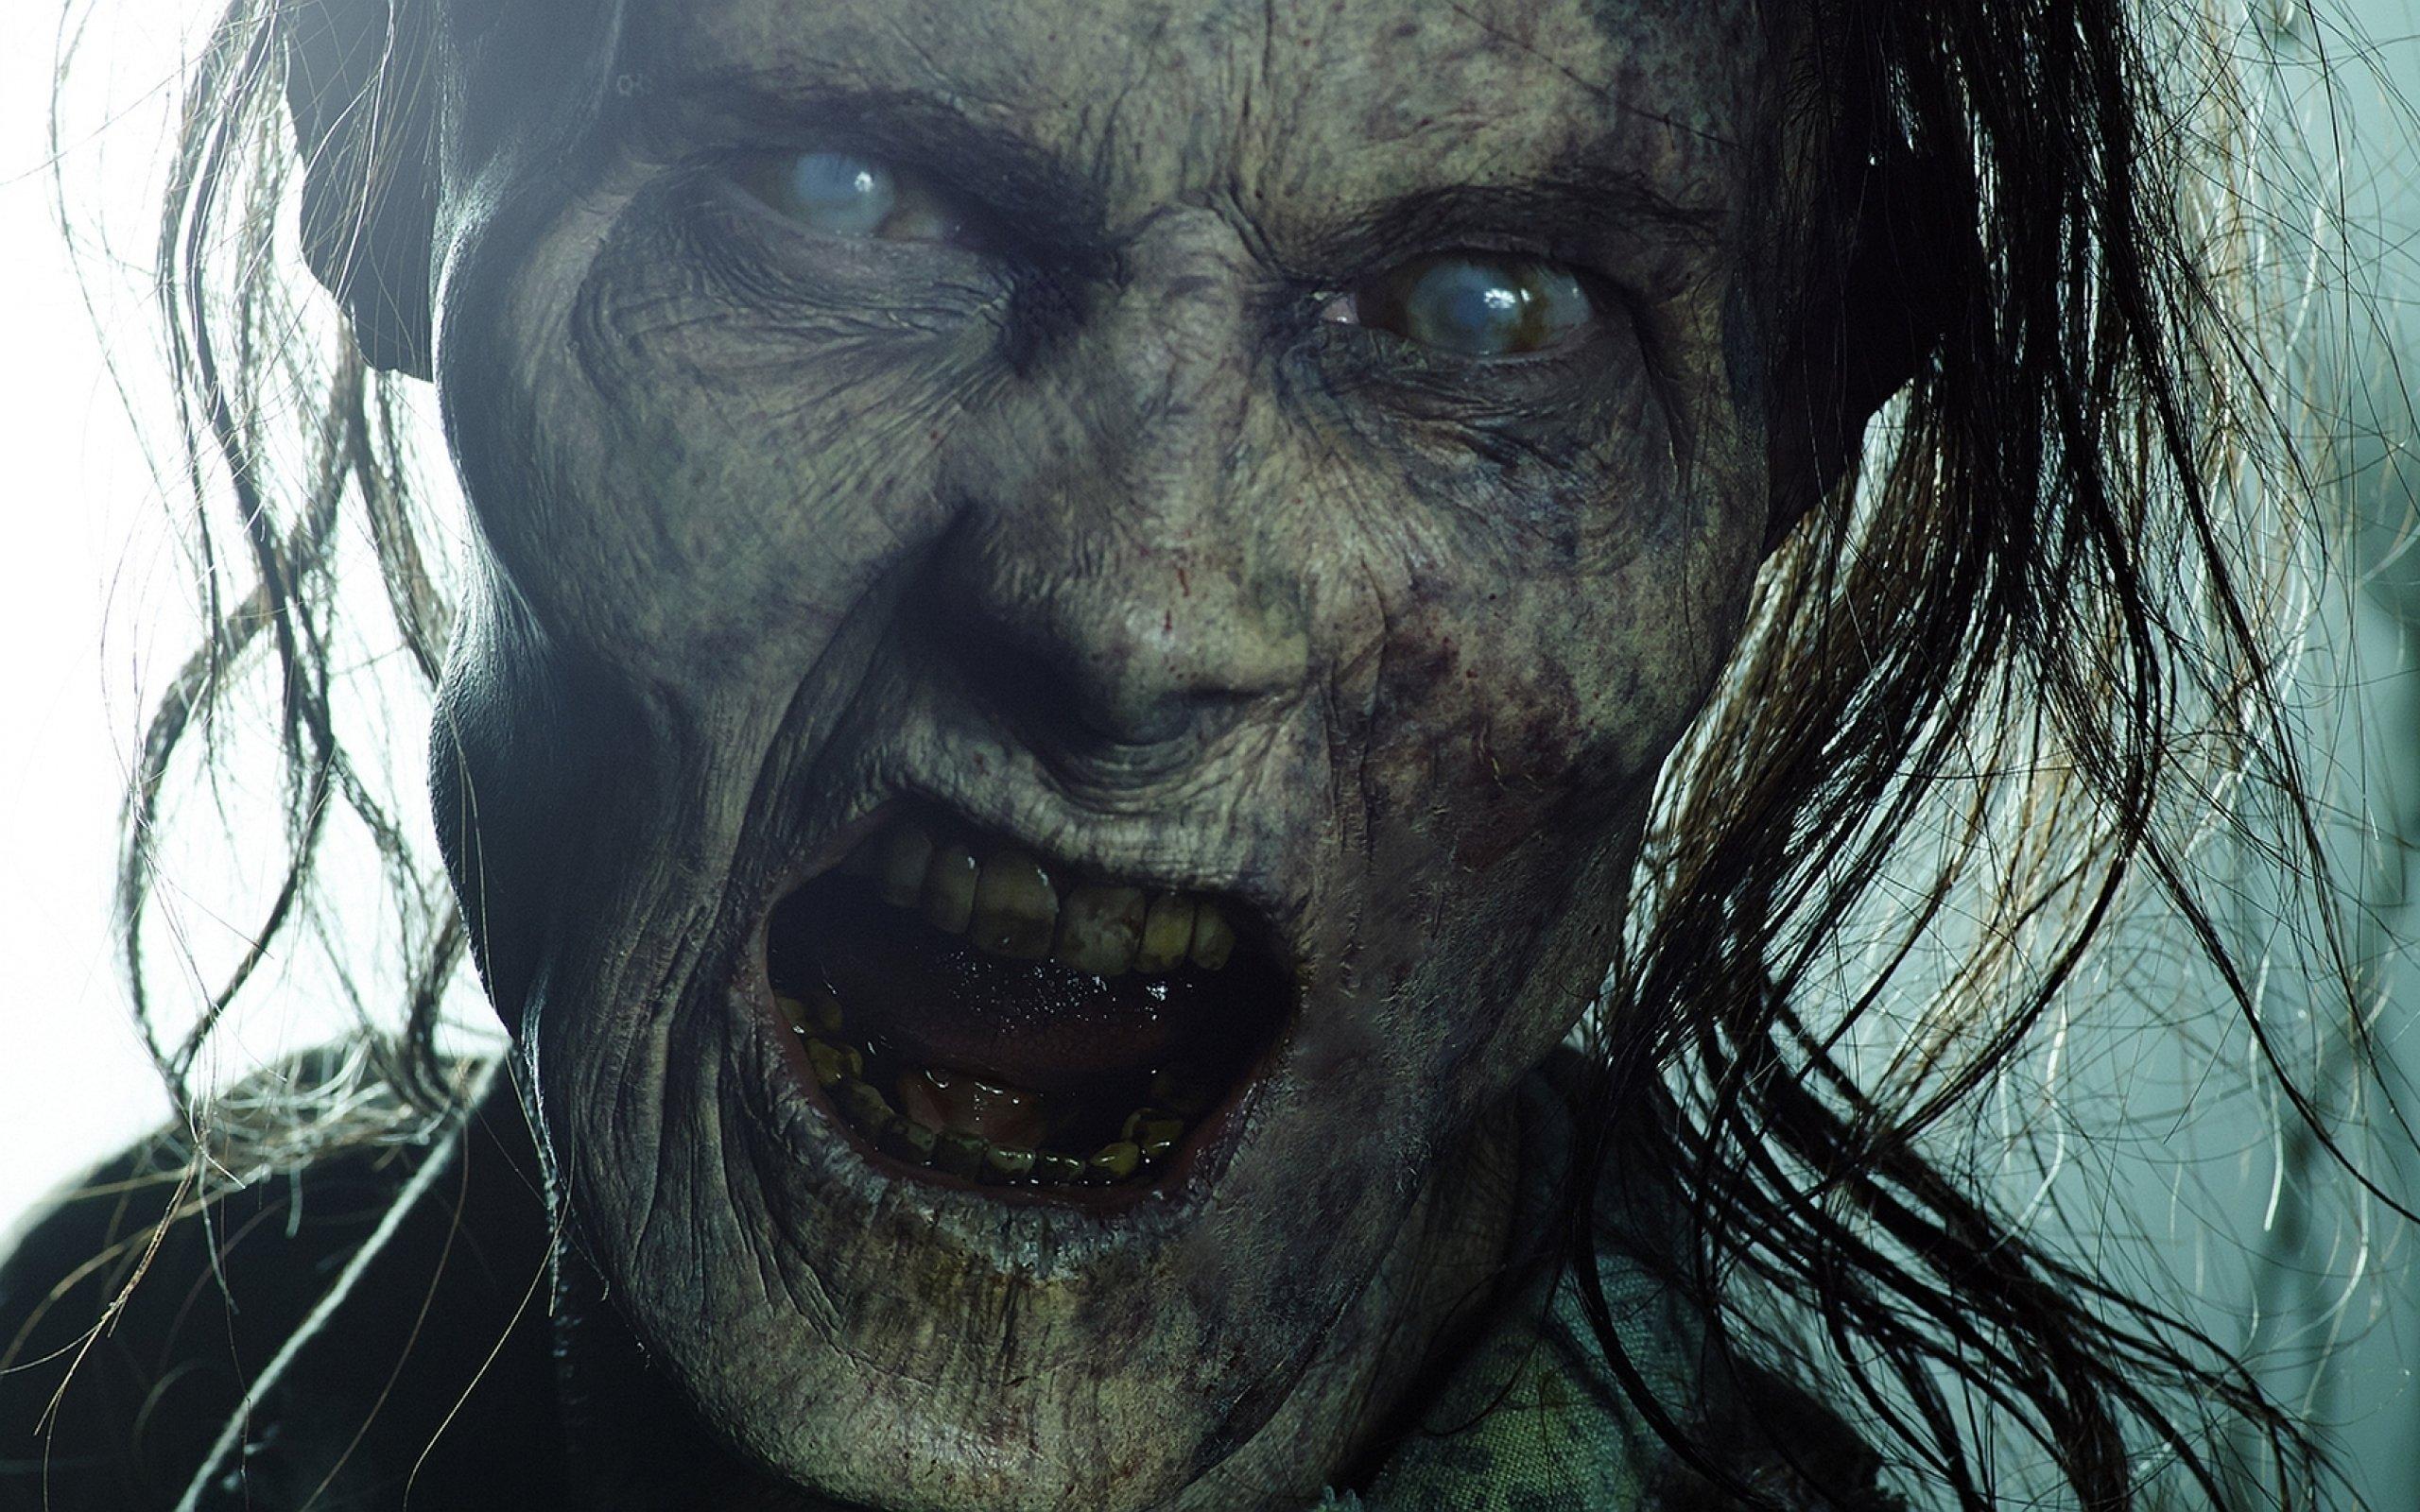 THE WALKING DEAD dark horror zombie series apocalyptic ...